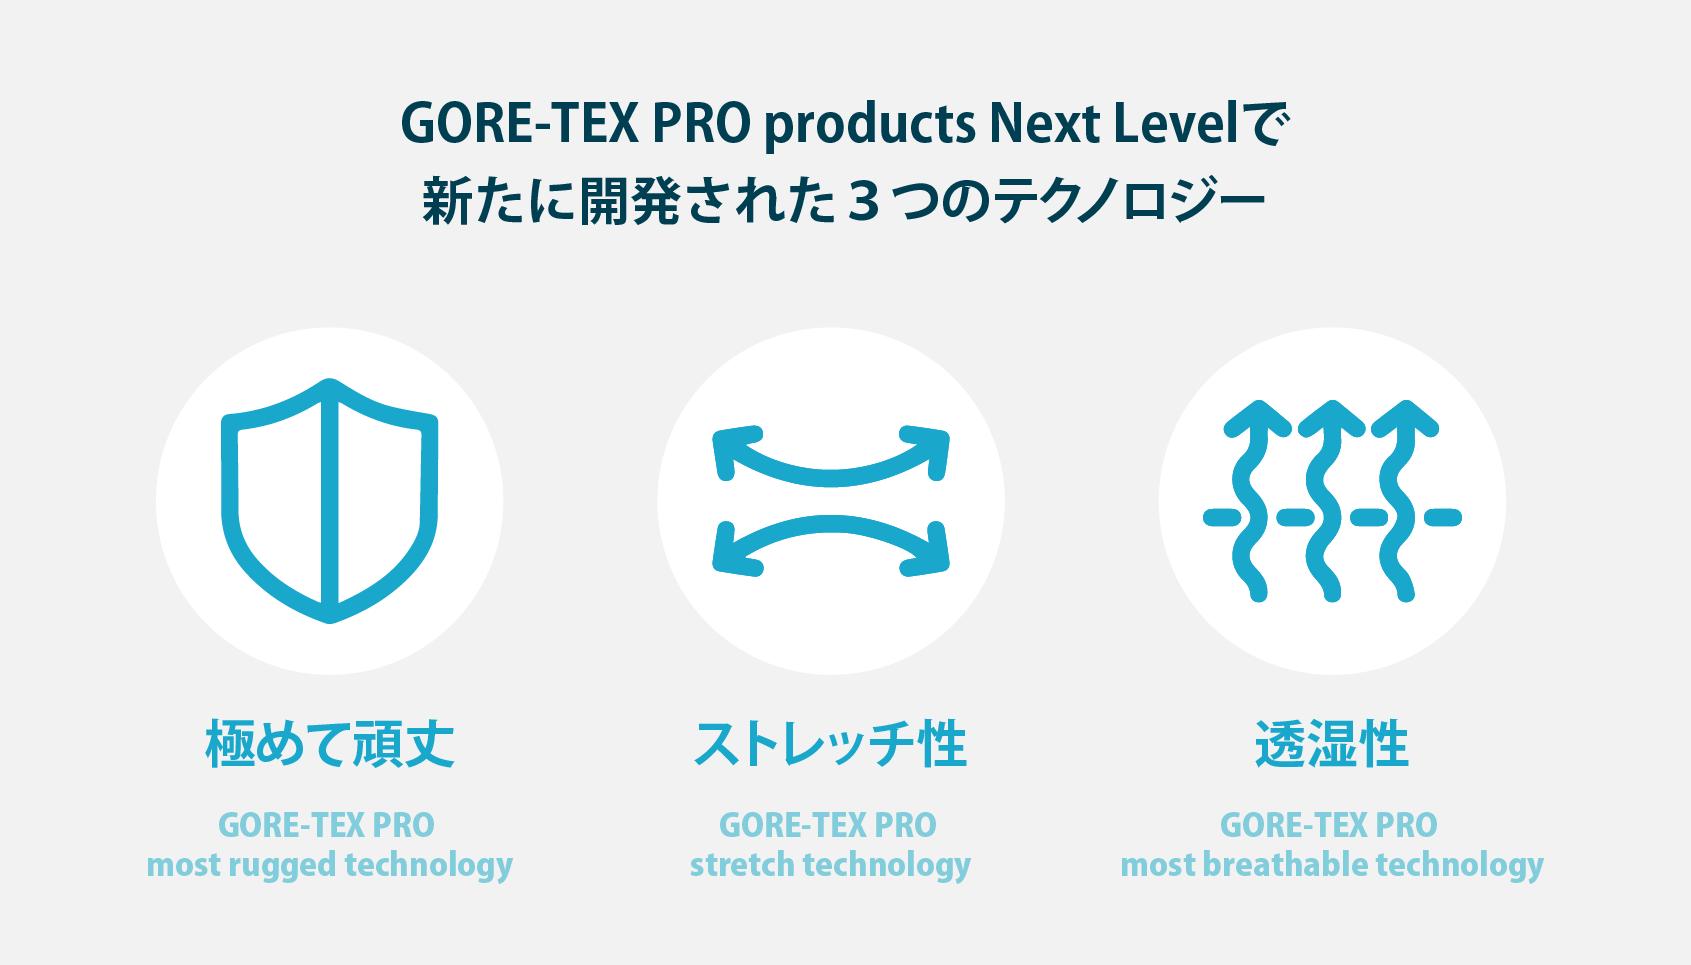 GORE-TEX PRO products Next Levelで新たに開発された3つのテクノロジー